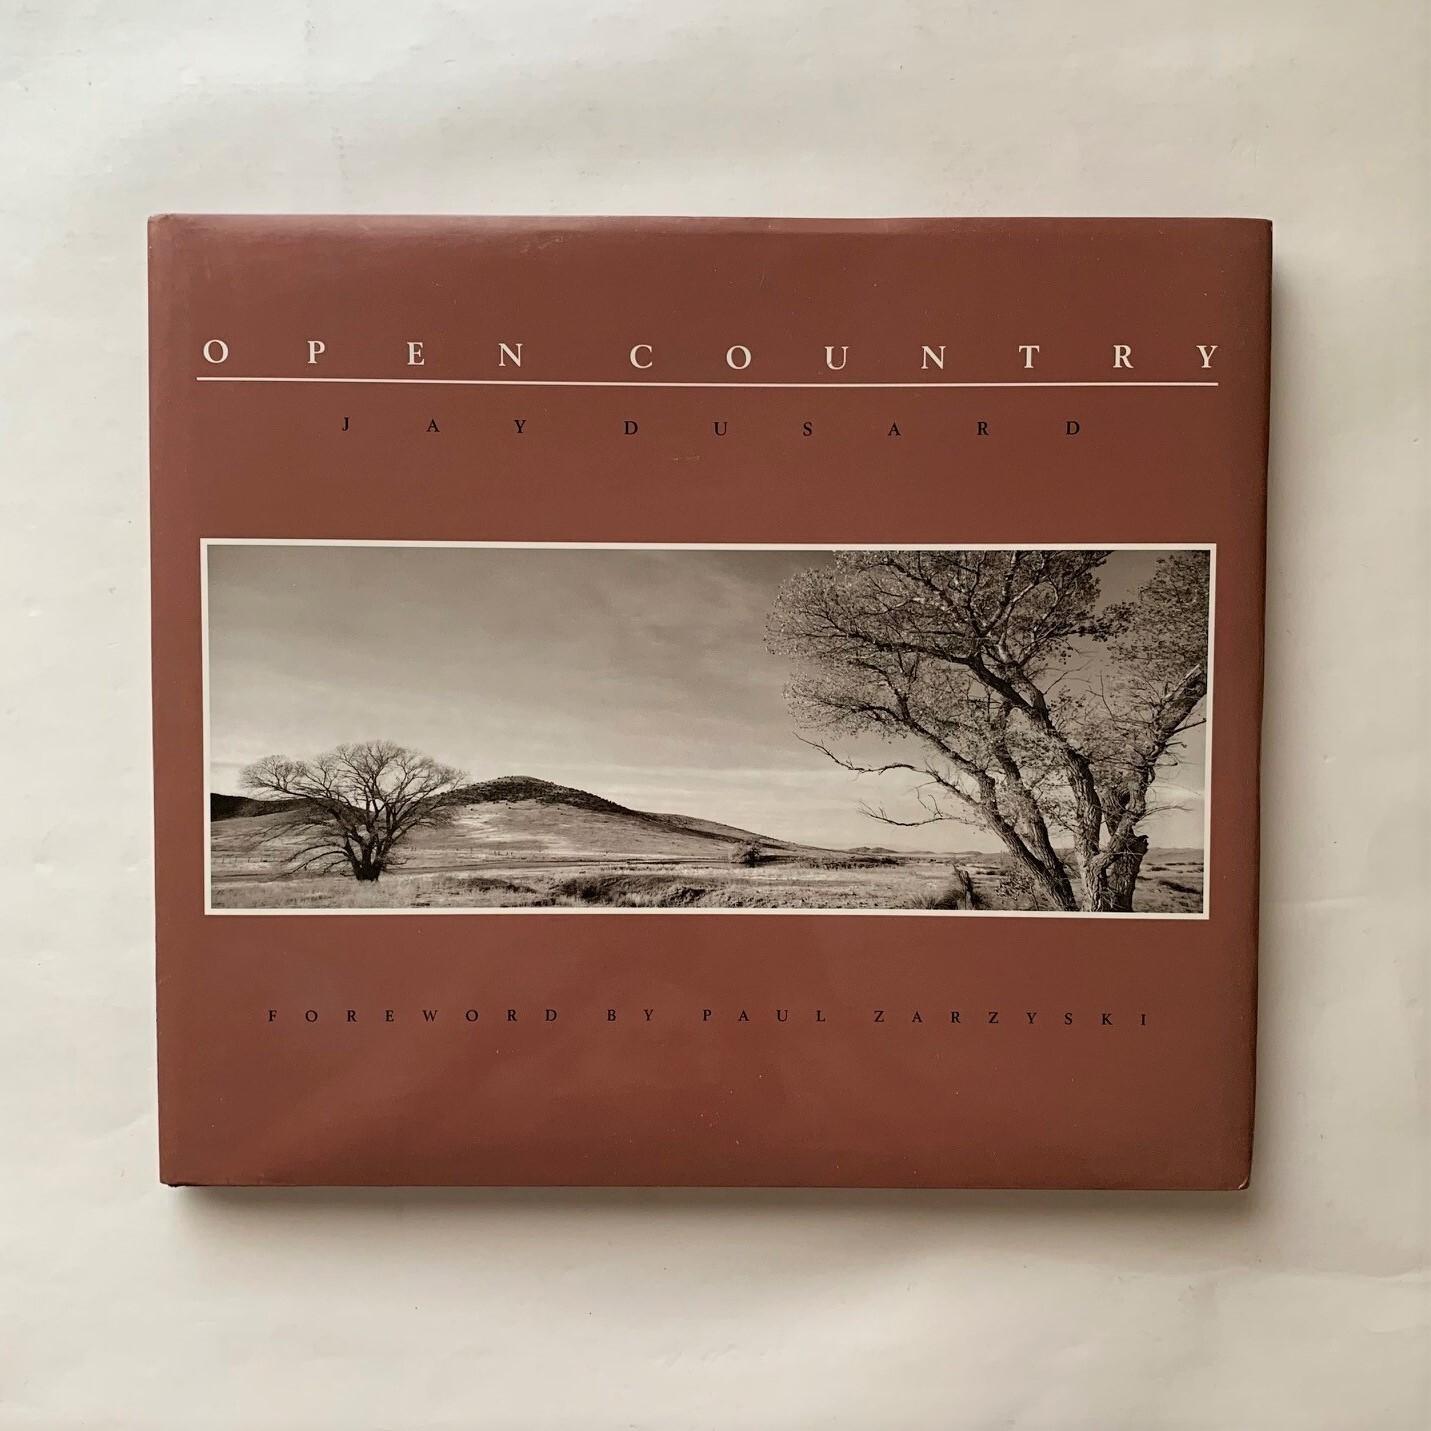 Open Country  /  Jay Dusard  /  Gibbs Smith